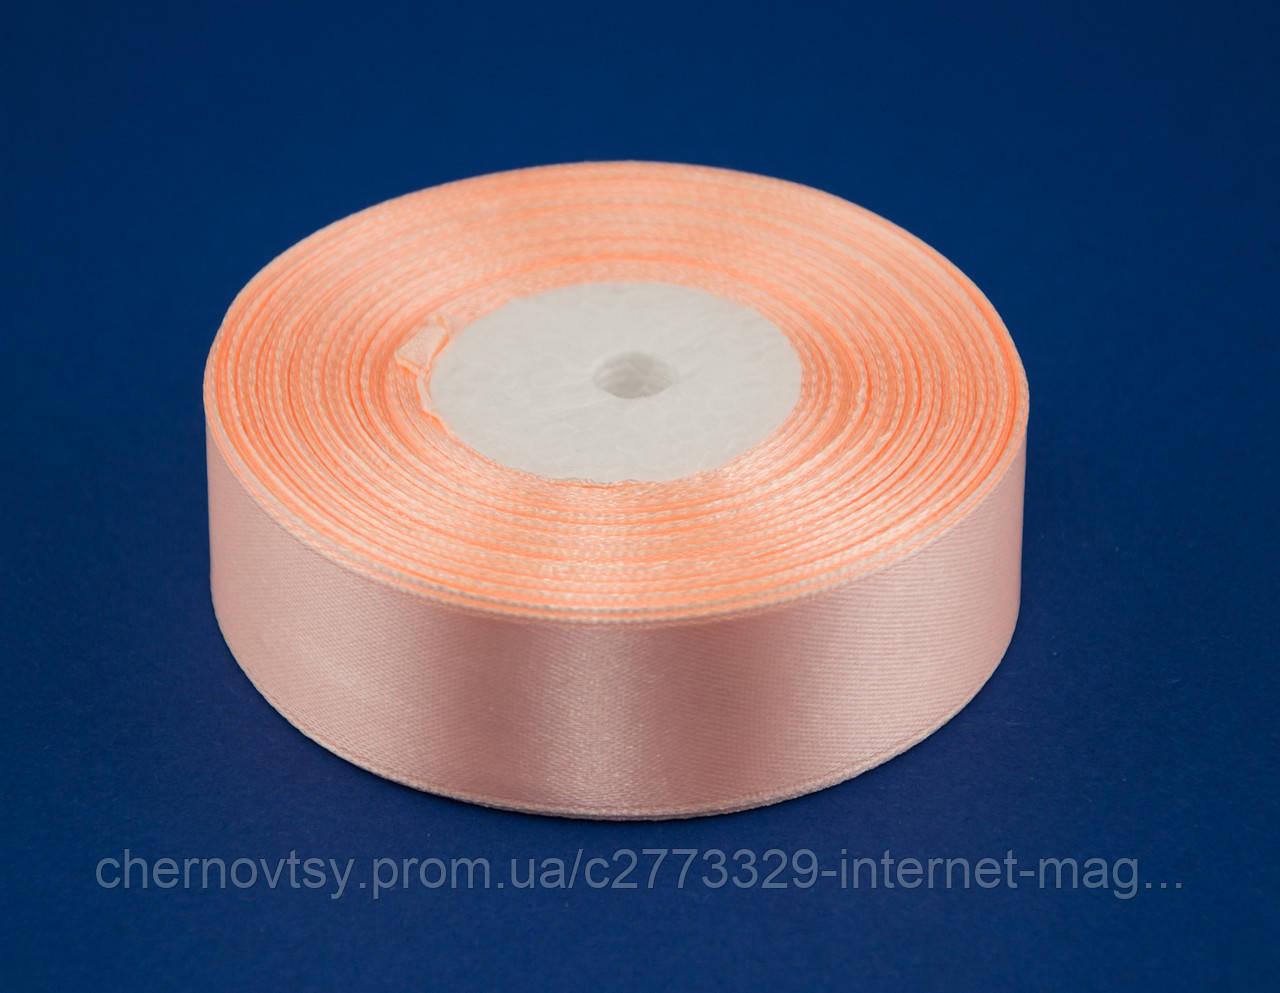 Лента атлас 0.9 см, 33 м, № 07 нежно персиковая